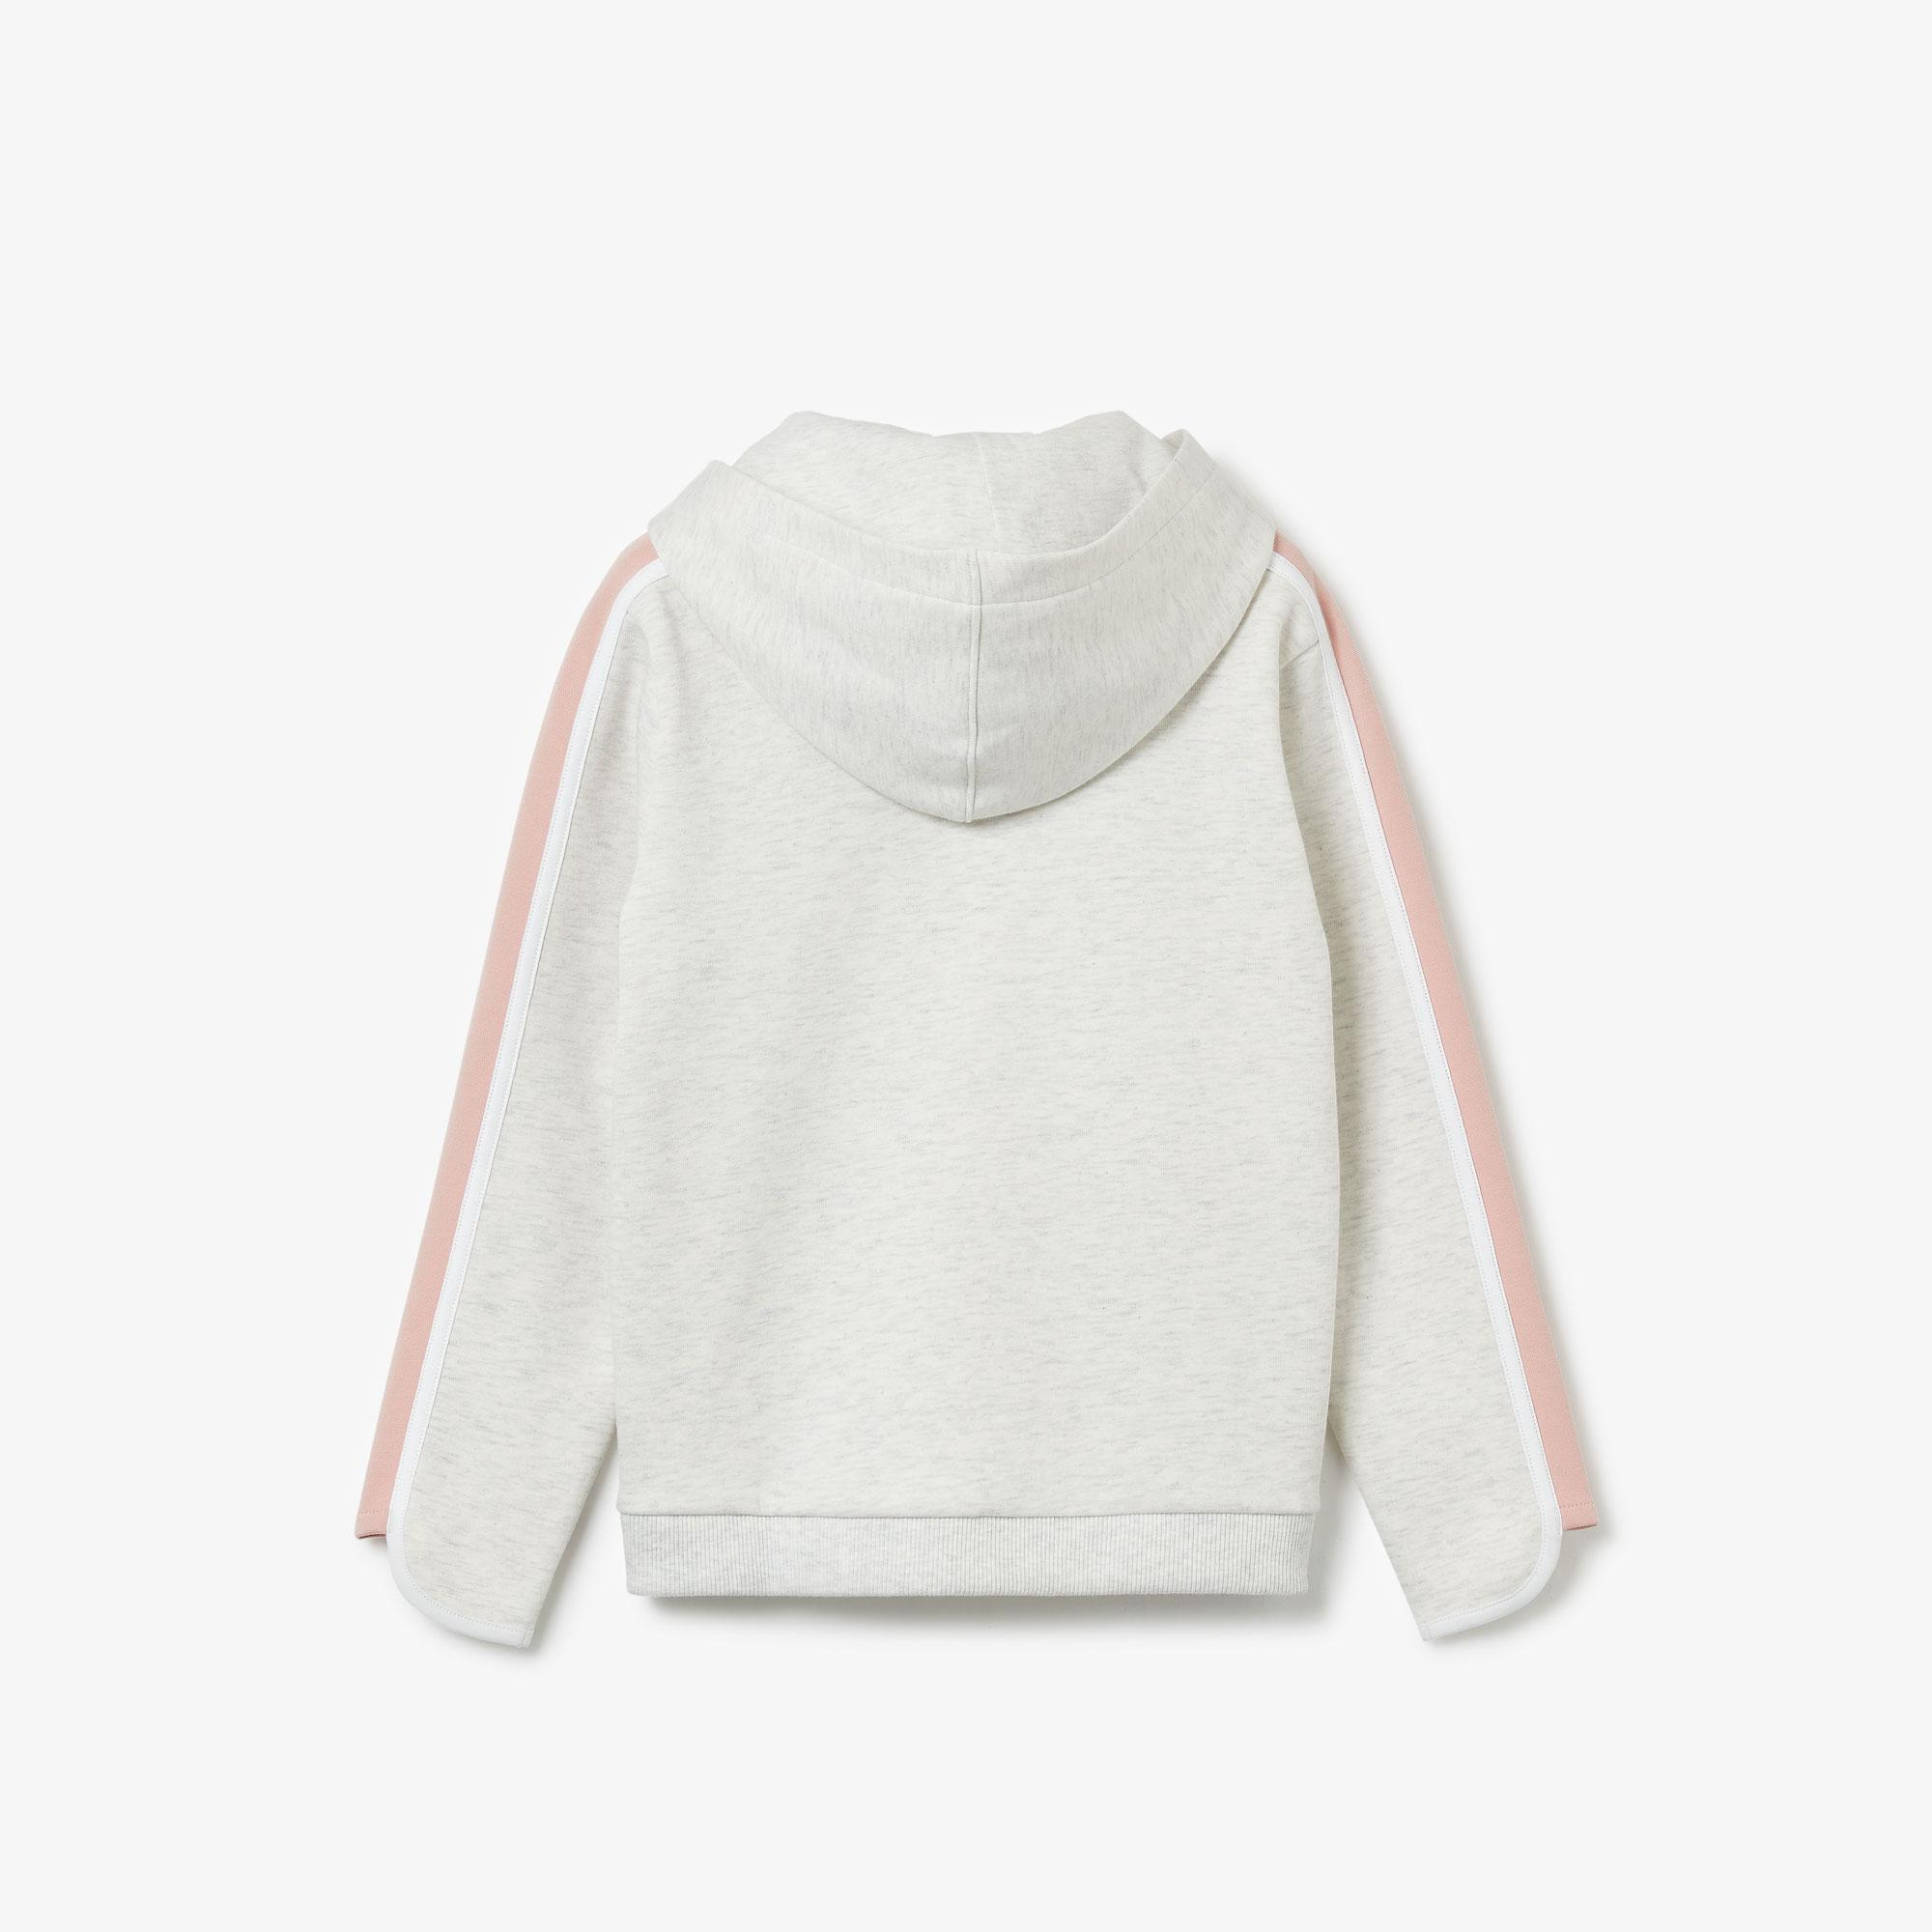 Lacoste Çocuk Kapüşonlu Açık Gri - Pembe Sweatshirt